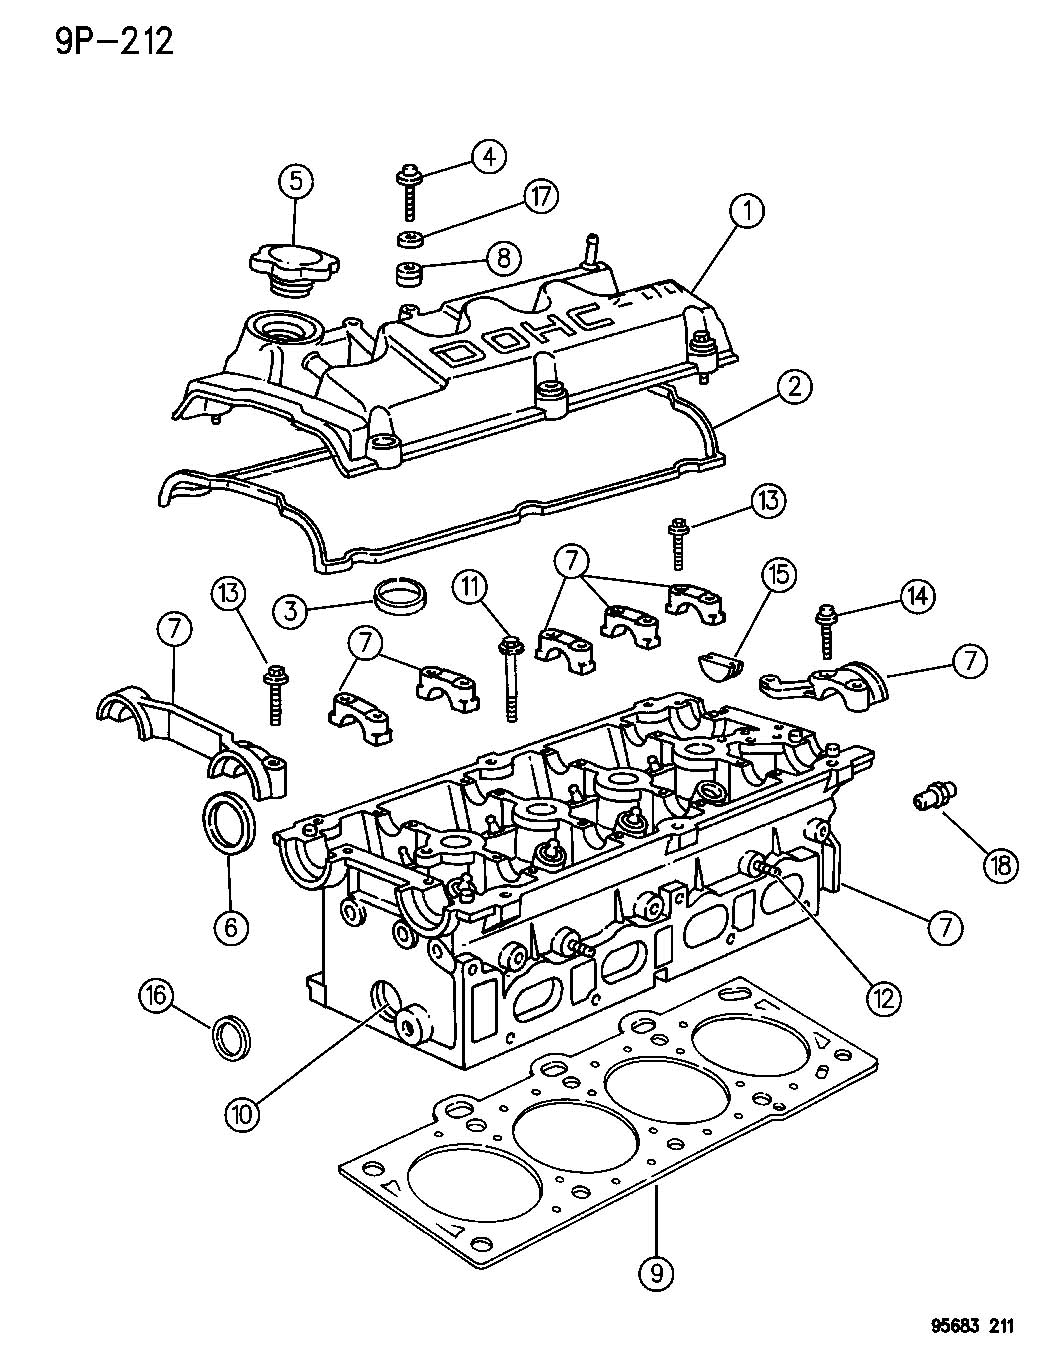 2000 durango infinity wiring diagram